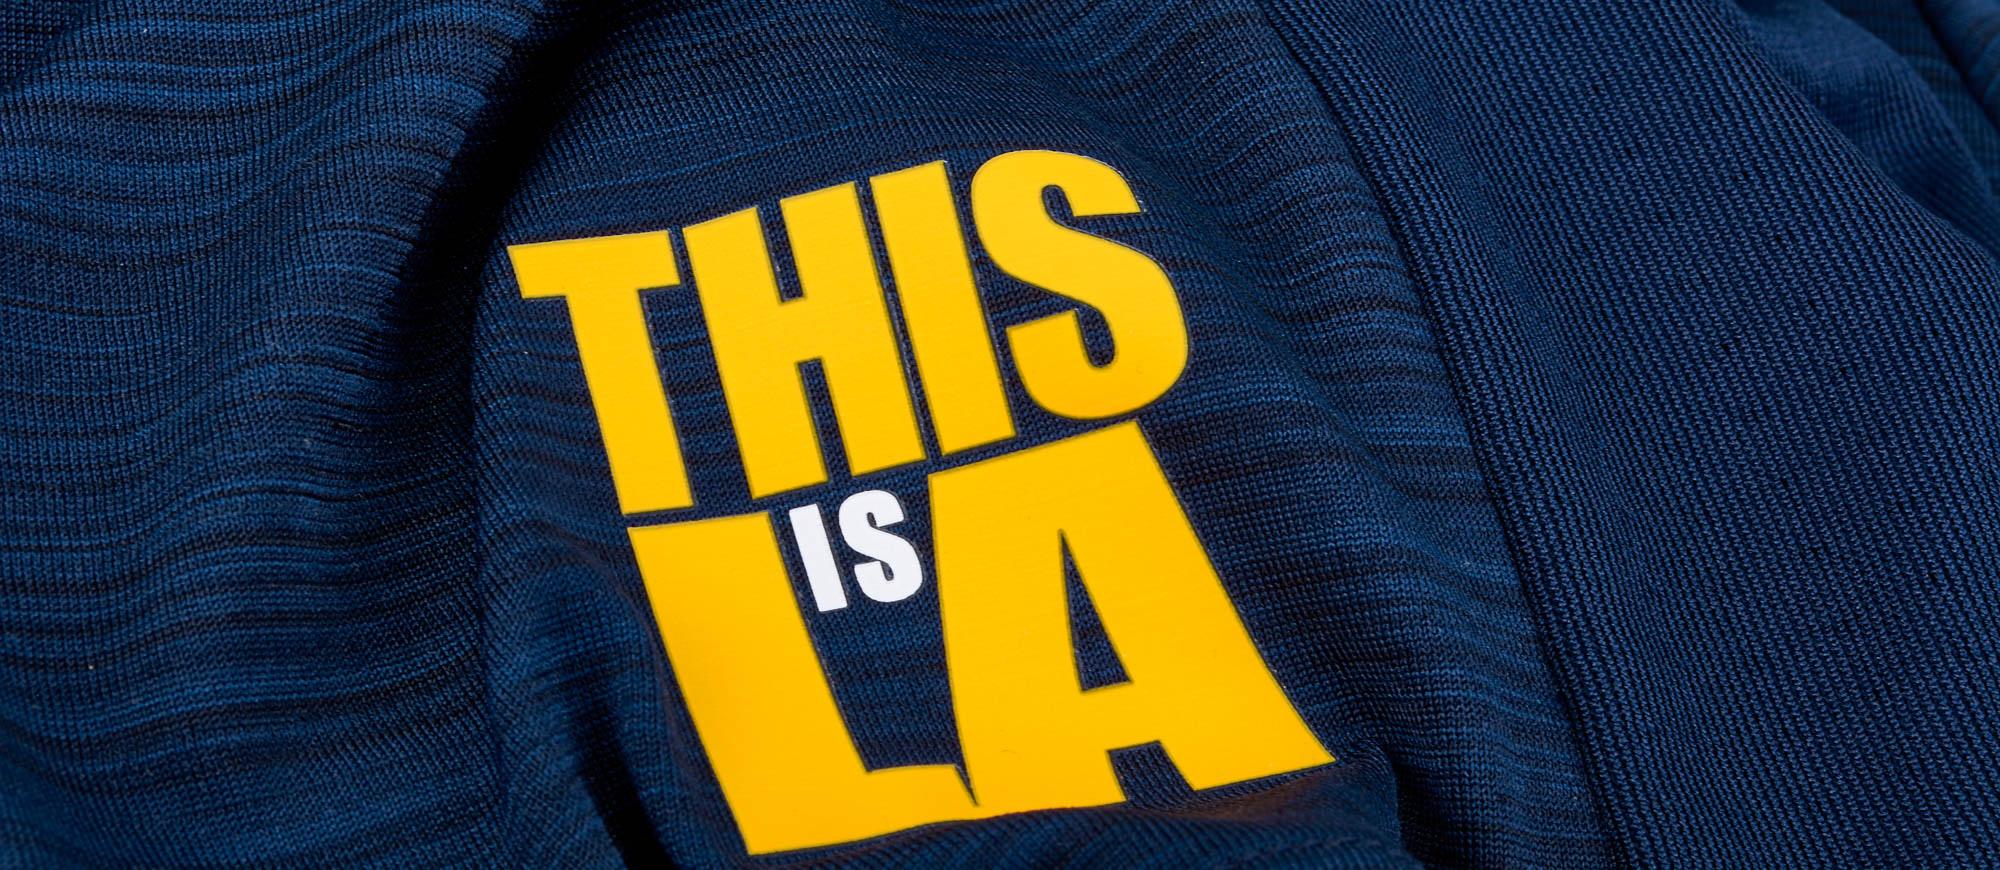 03a12133a80 adidas Authentic LA Galaxy Away Jersey - 2017 18